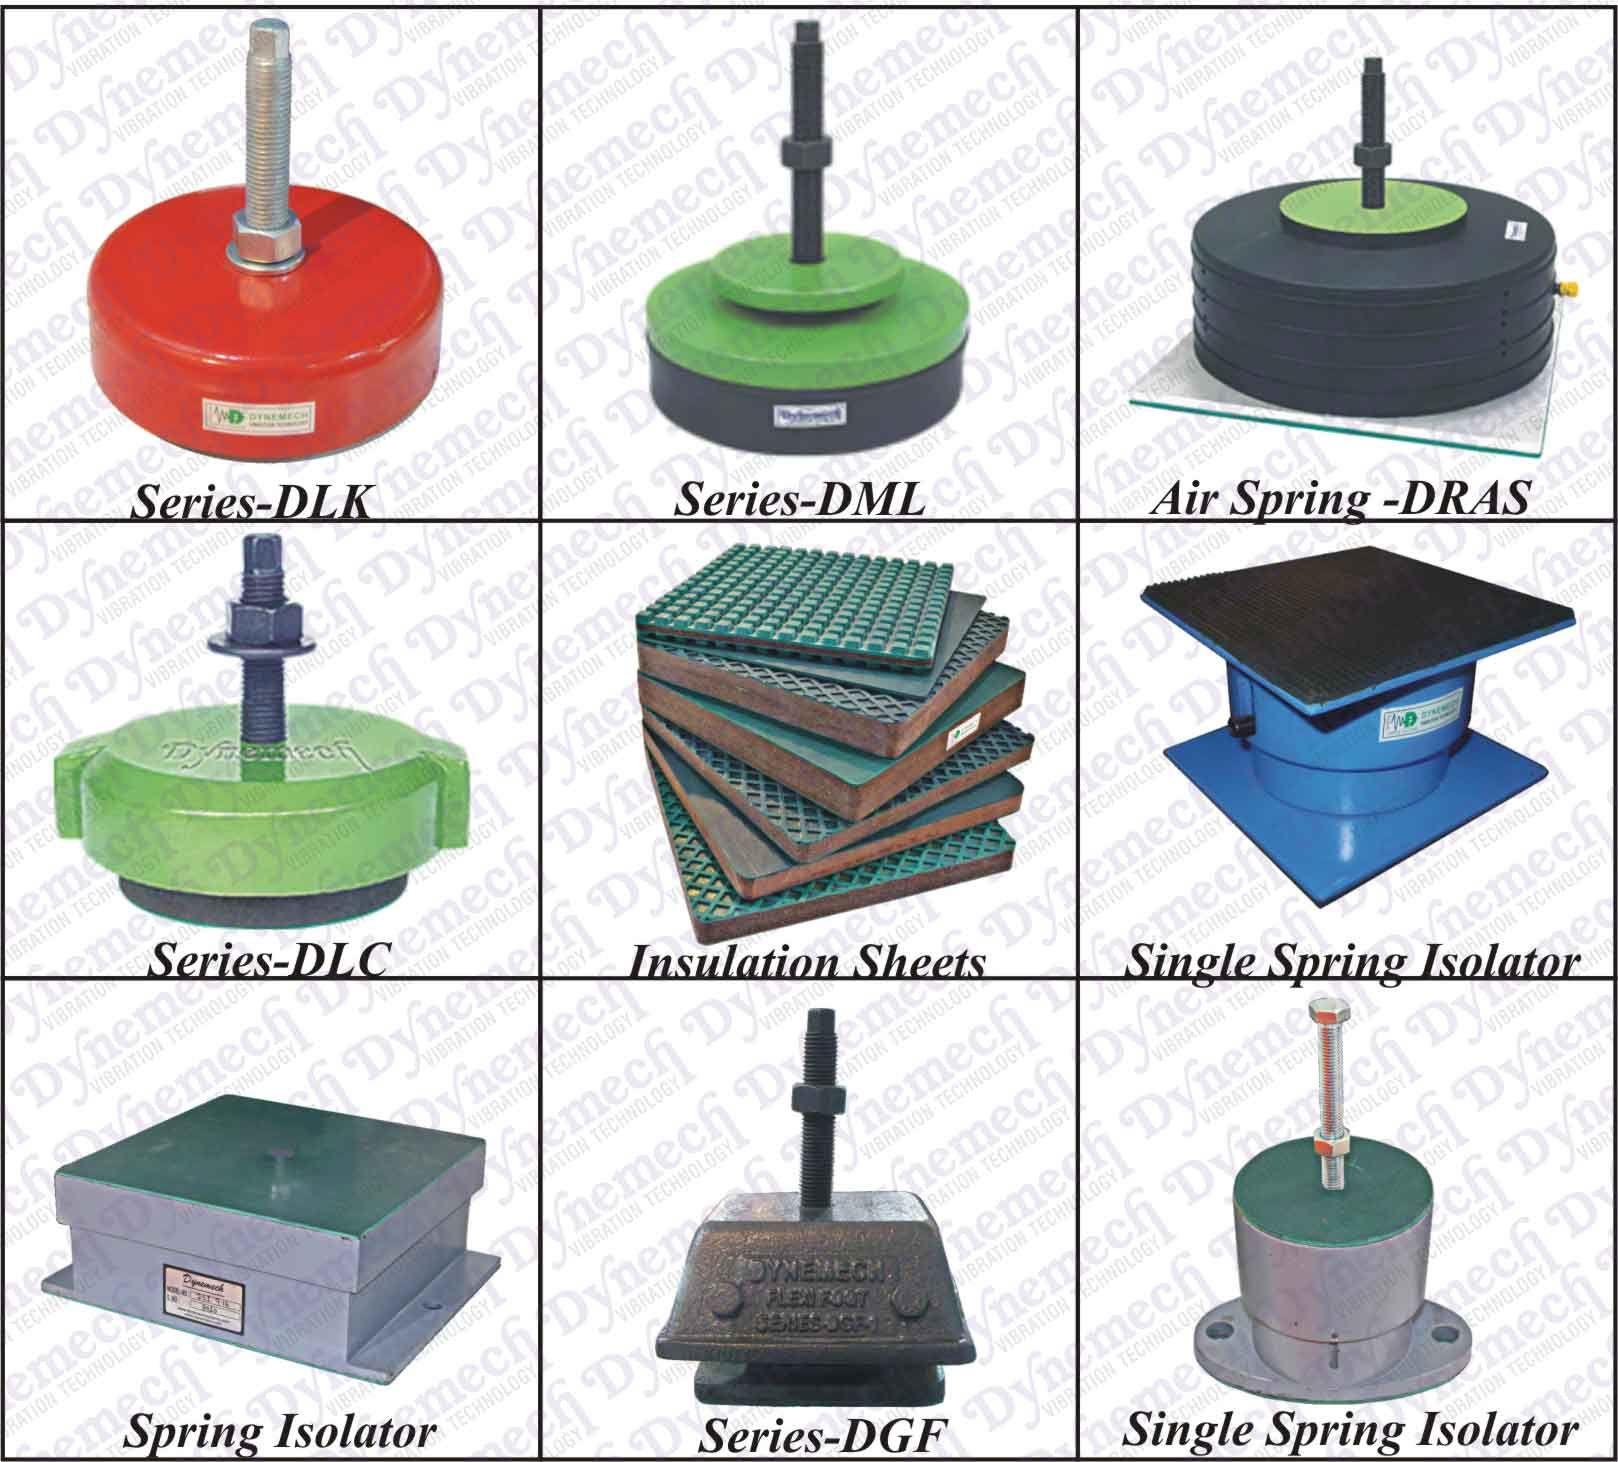 Vibration isolation equipment. Vibration insulation materials 34